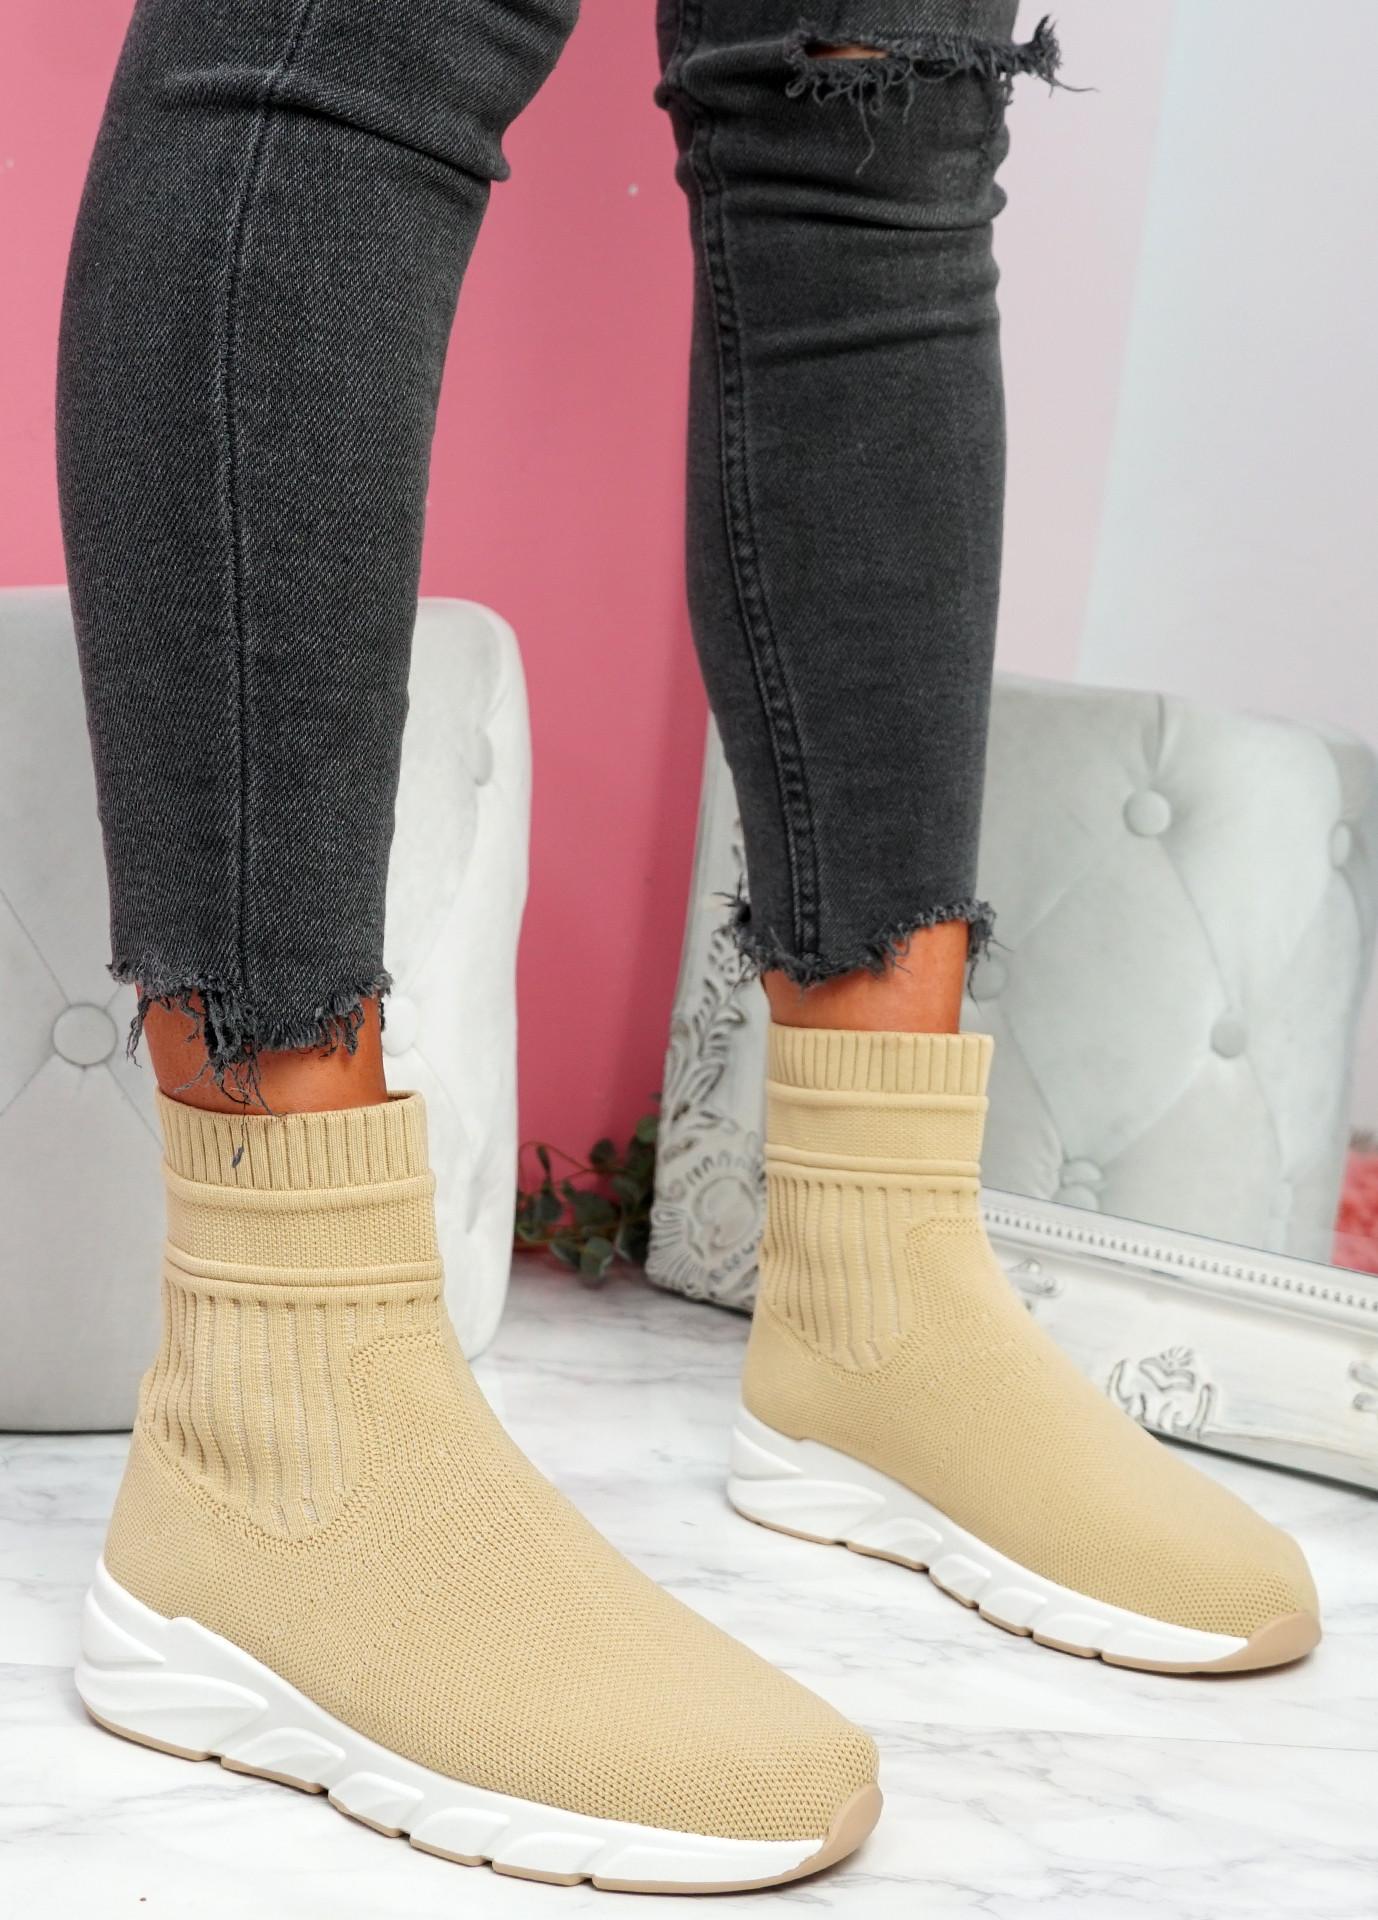 Mimmy Khaki Sock Sneakers